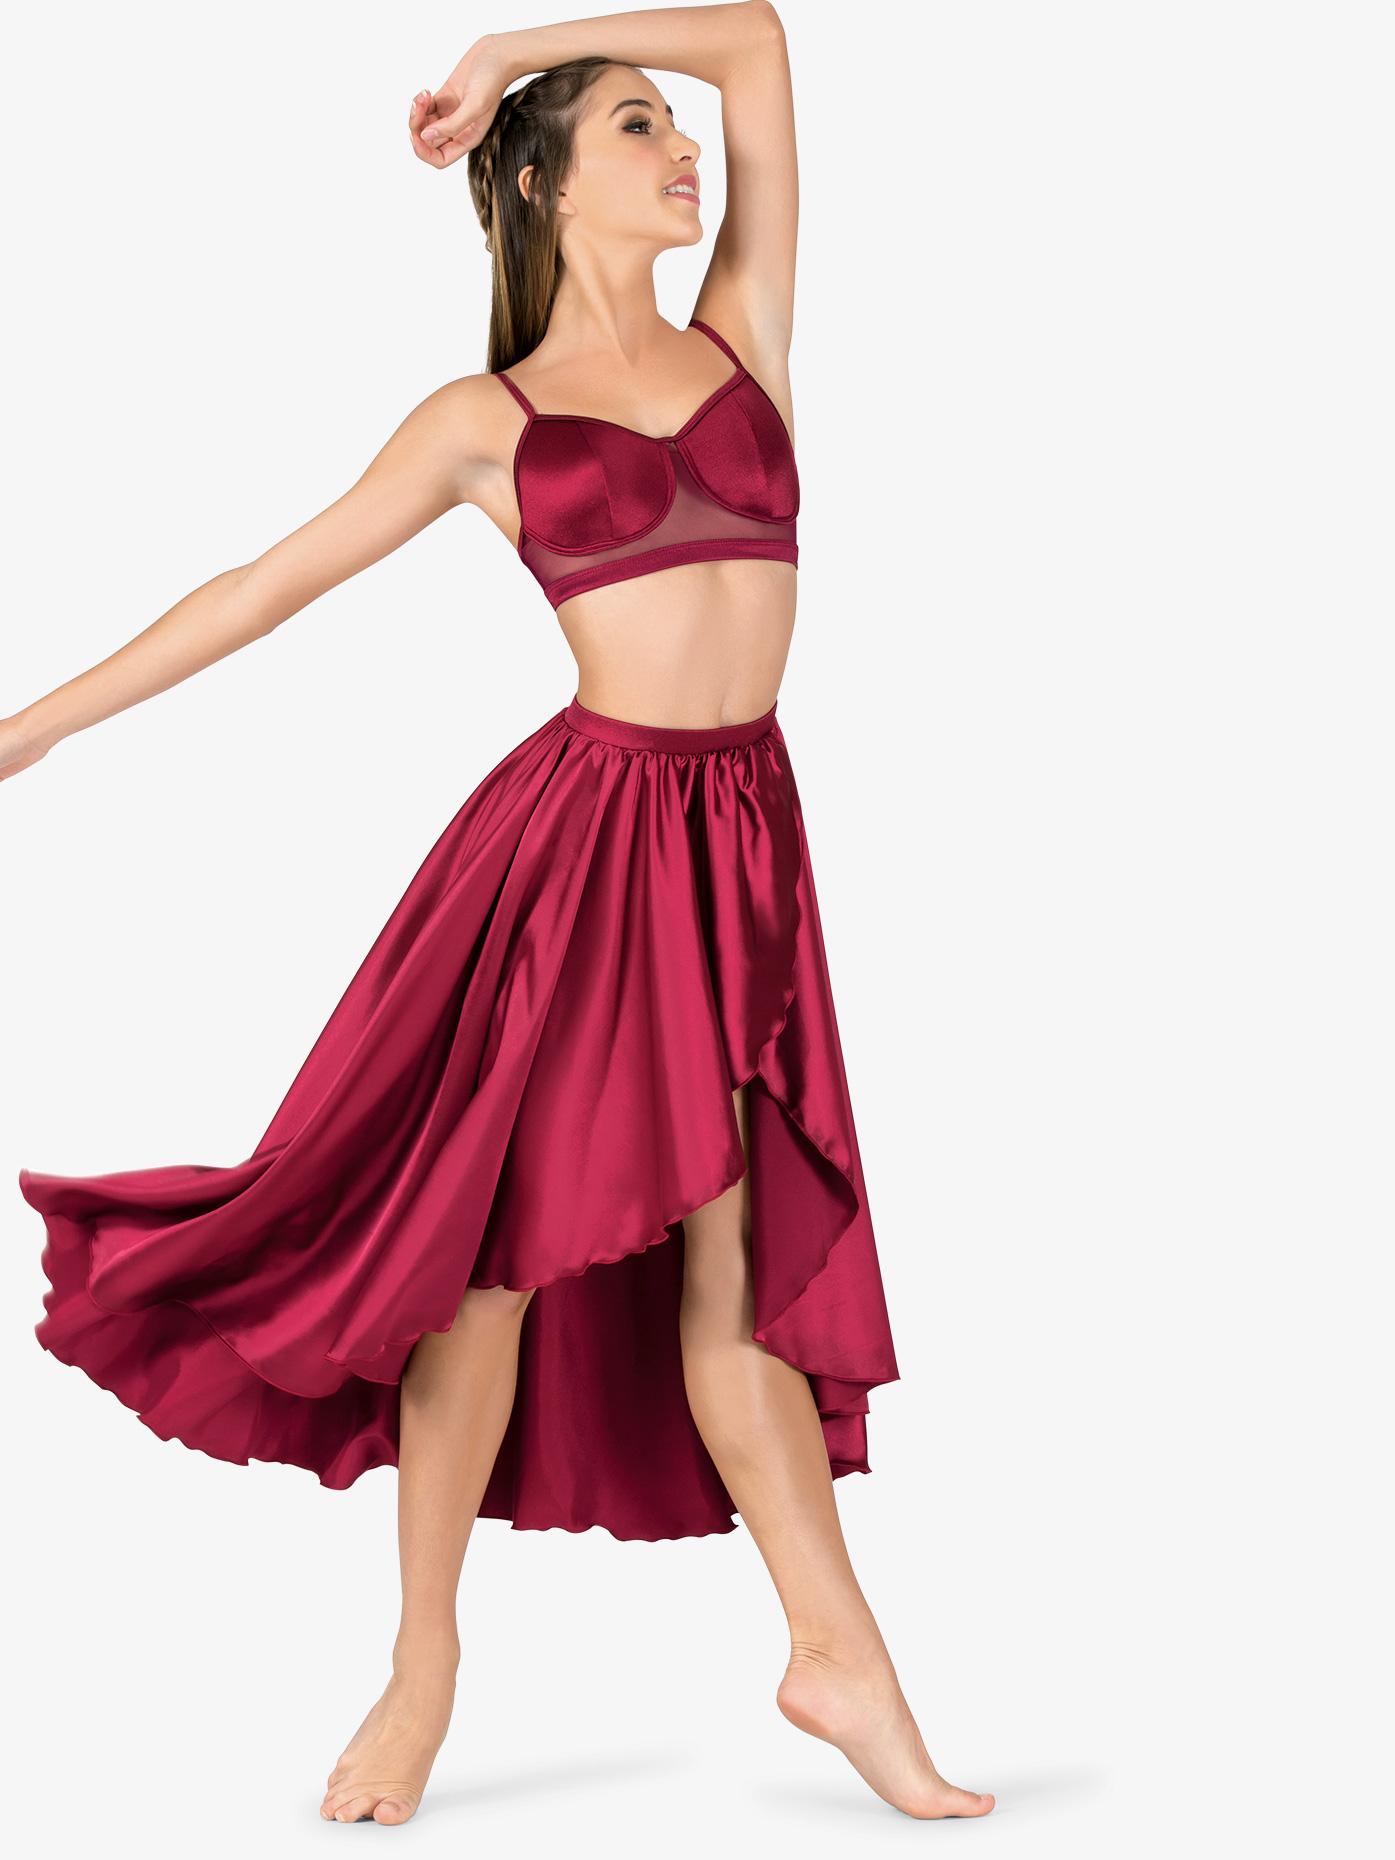 Double Platinum Womens Performance Satin Mock Wrap Skirt N7684